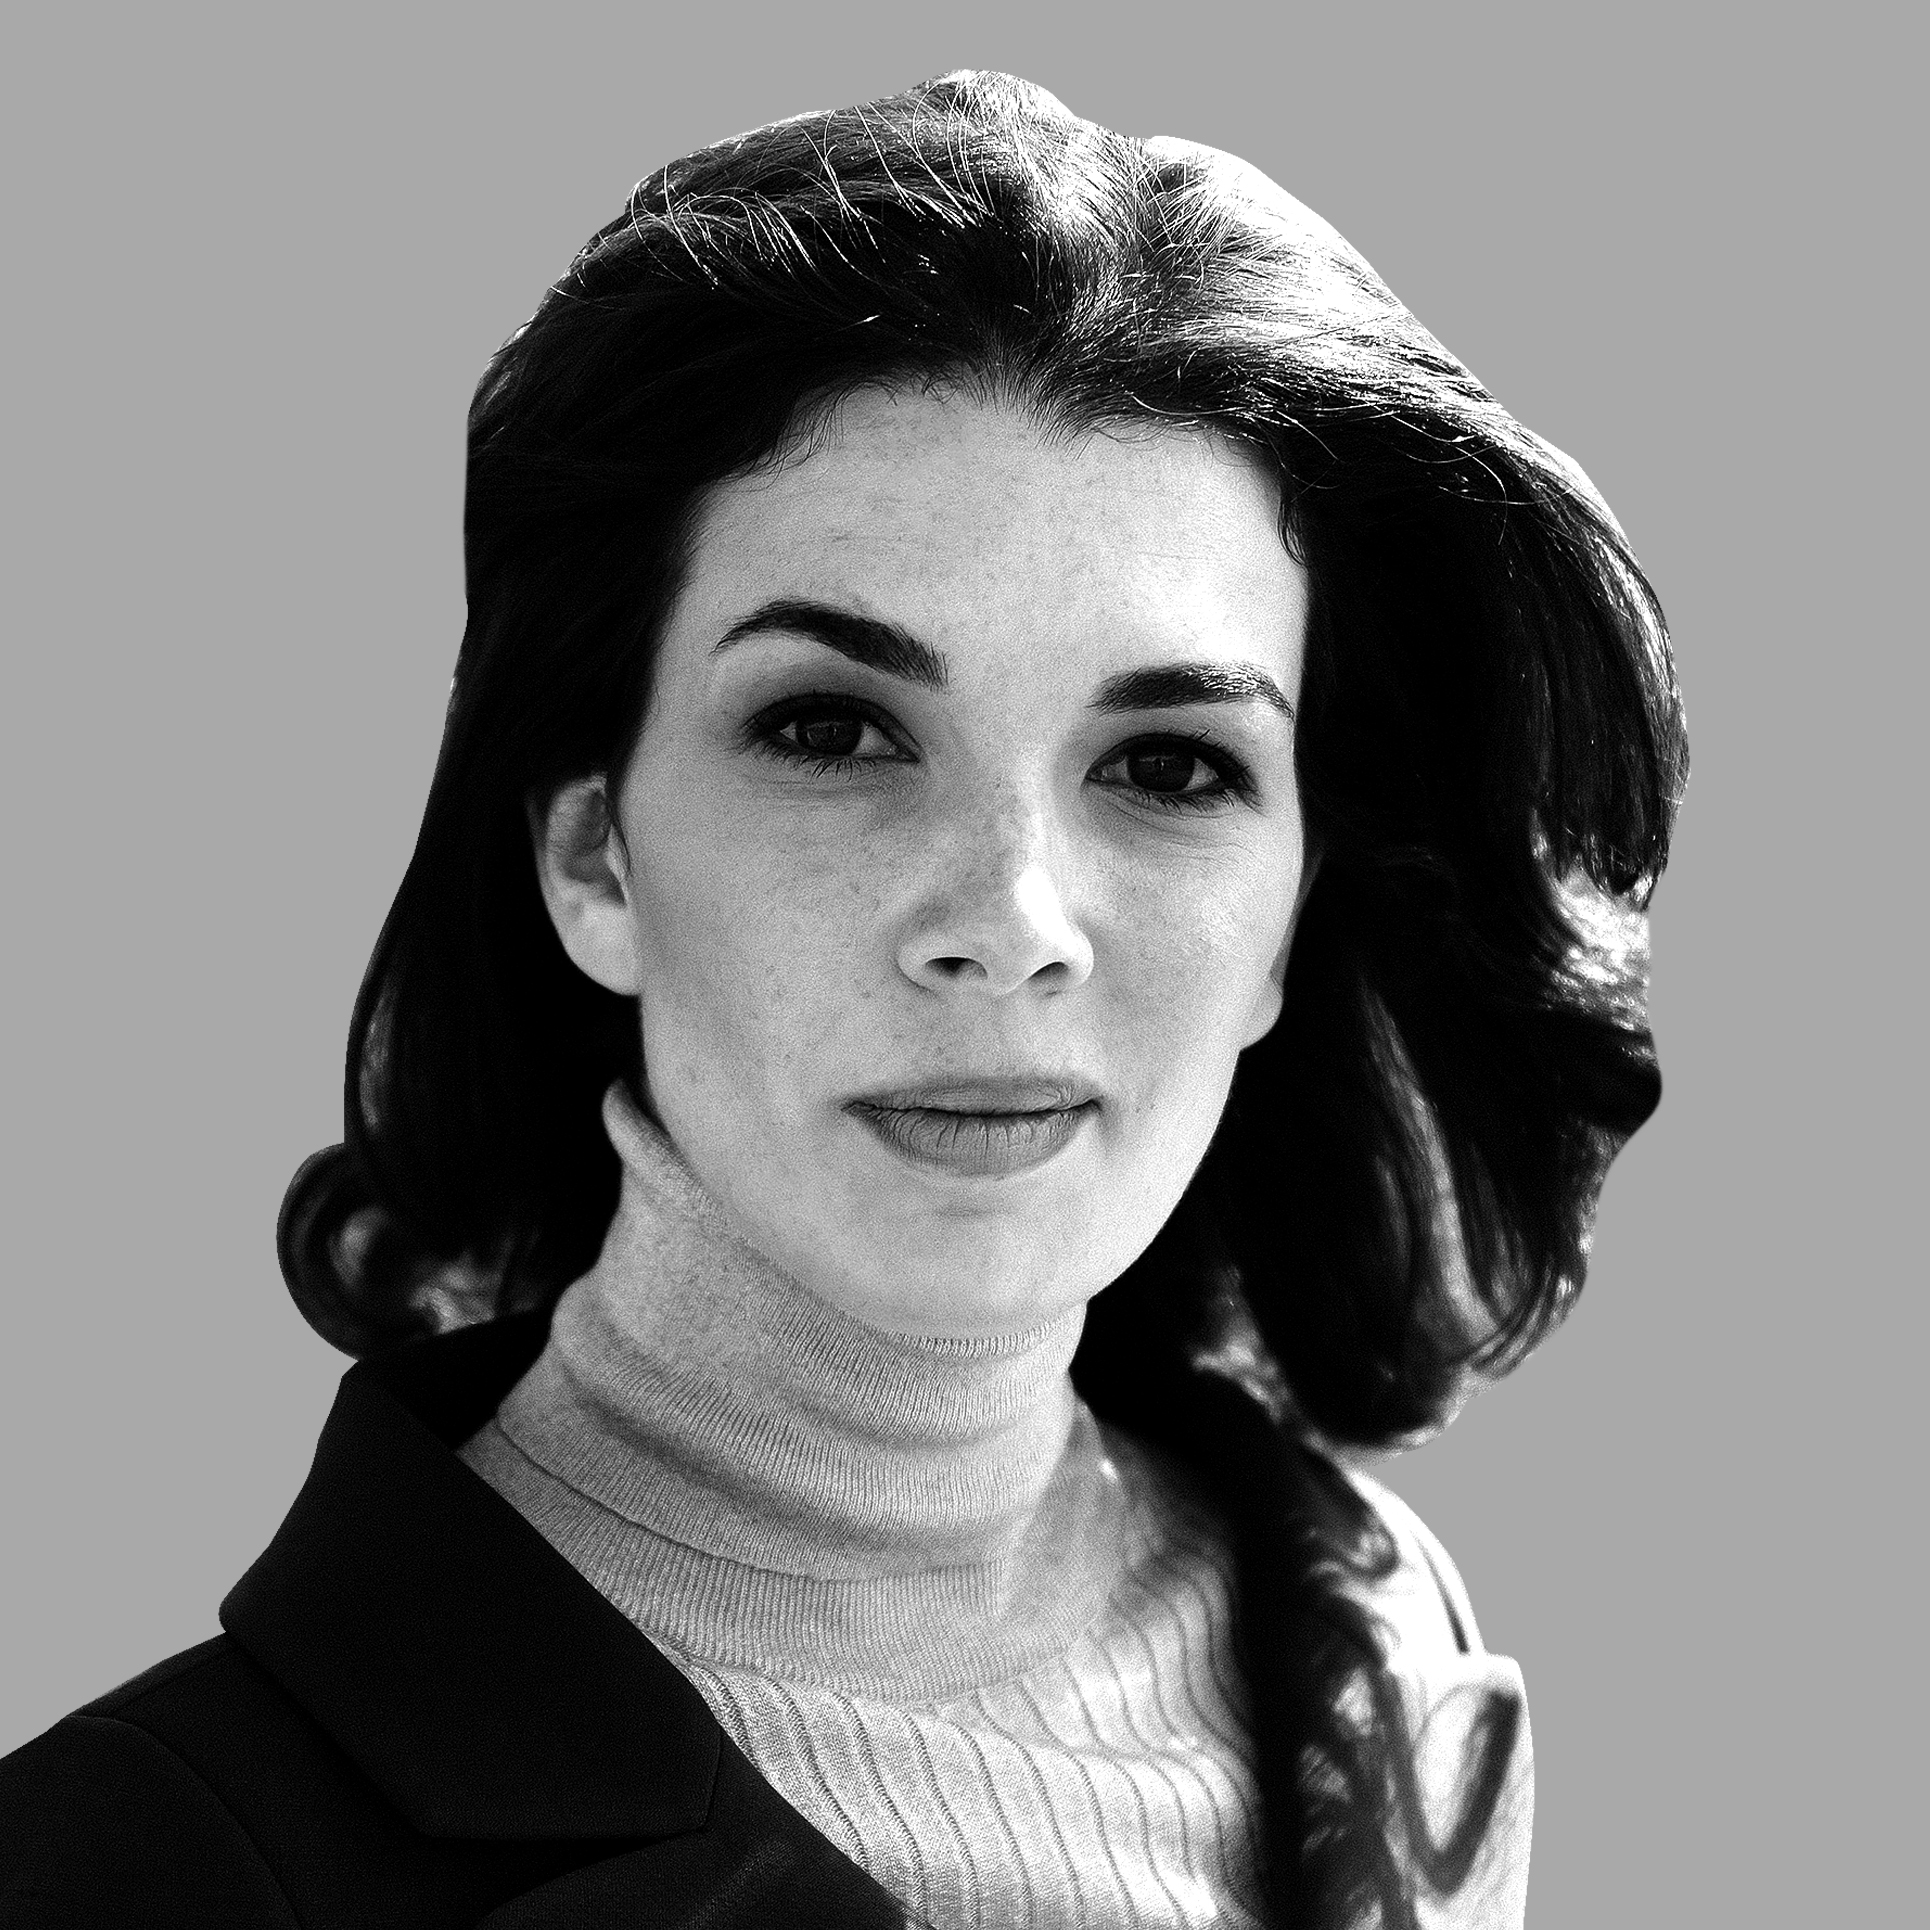 Natalia Fishman-Bekmambetova